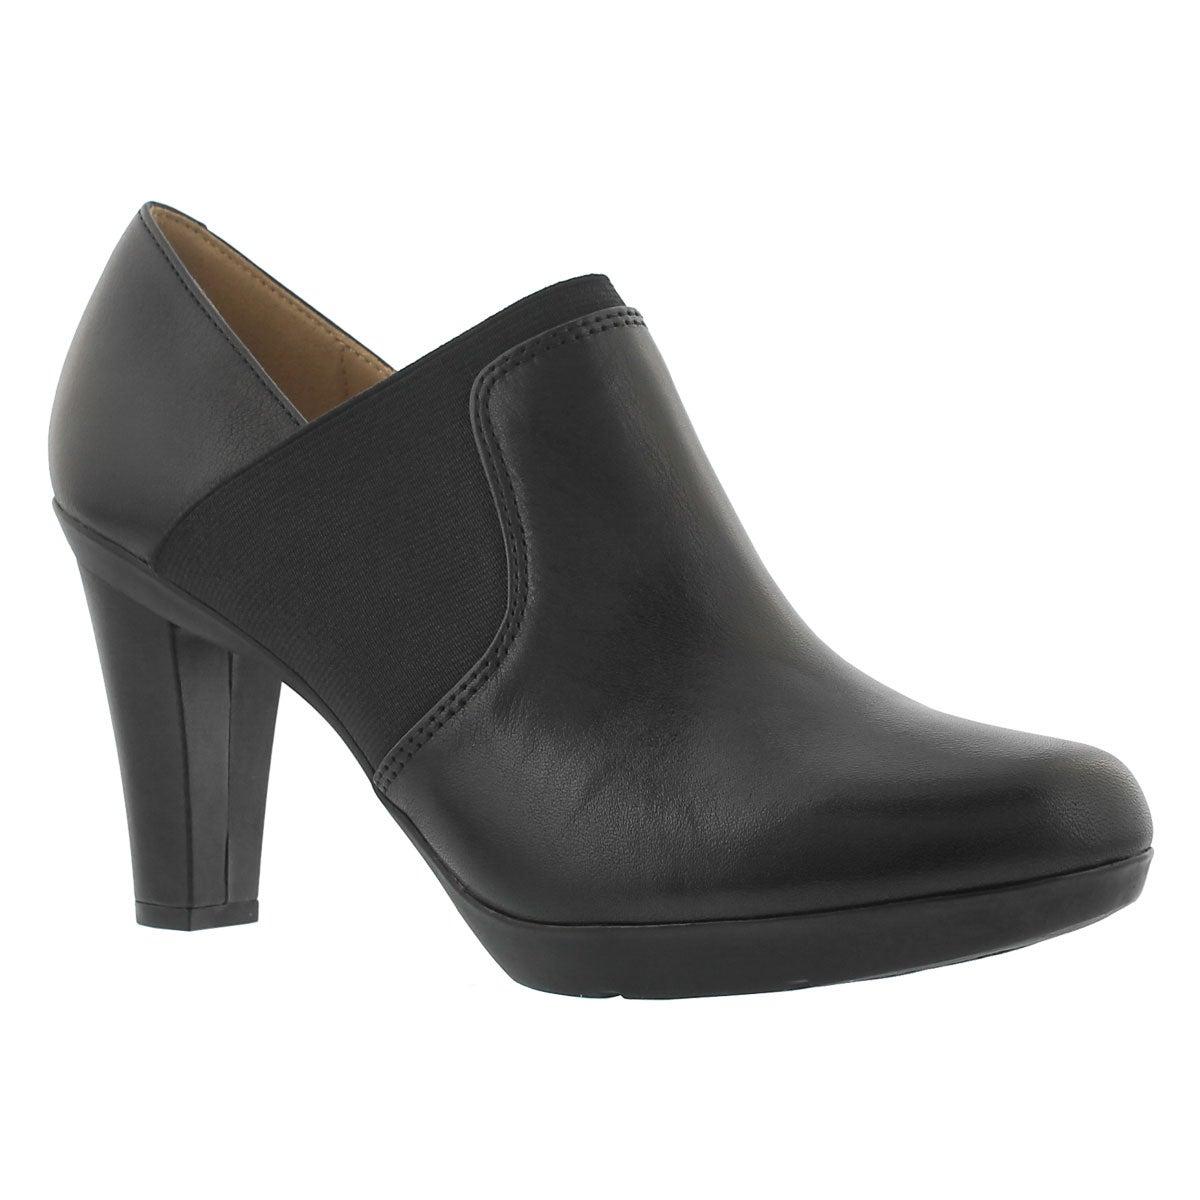 Lds Inspiration blk leather dress heel